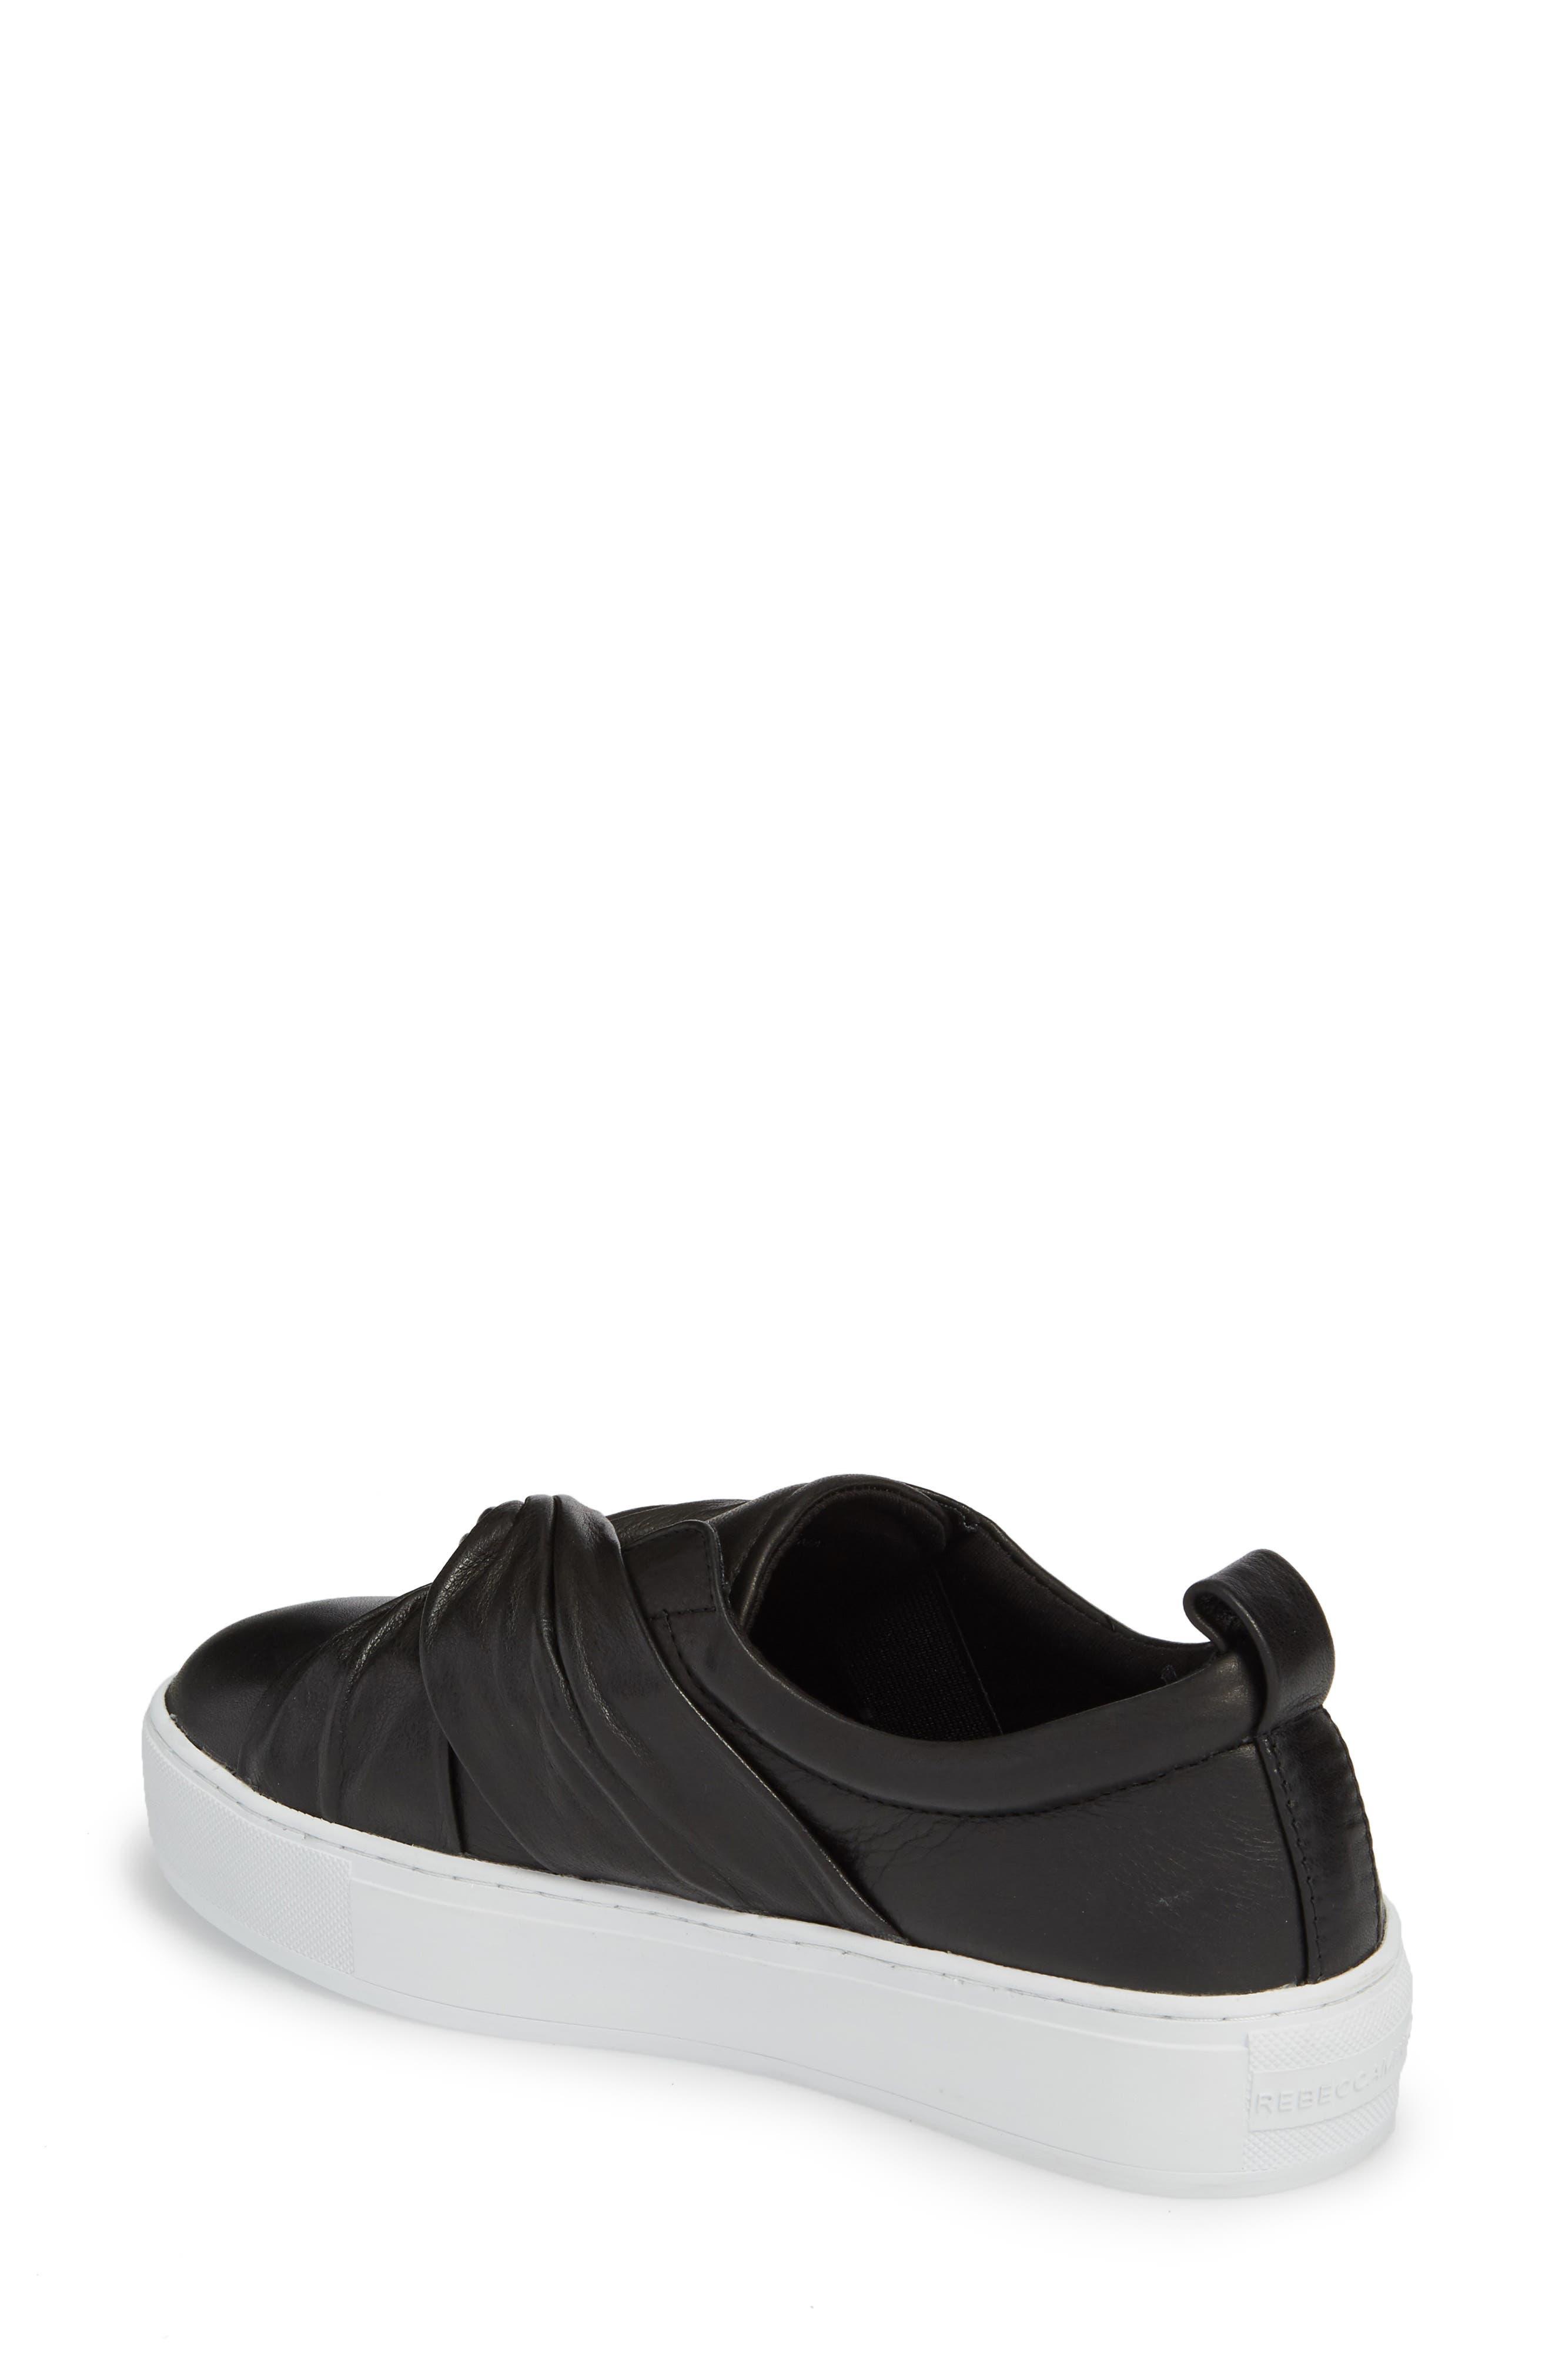 Nicole Platform Sneaker,                             Alternate thumbnail 2, color,                             Black Leather